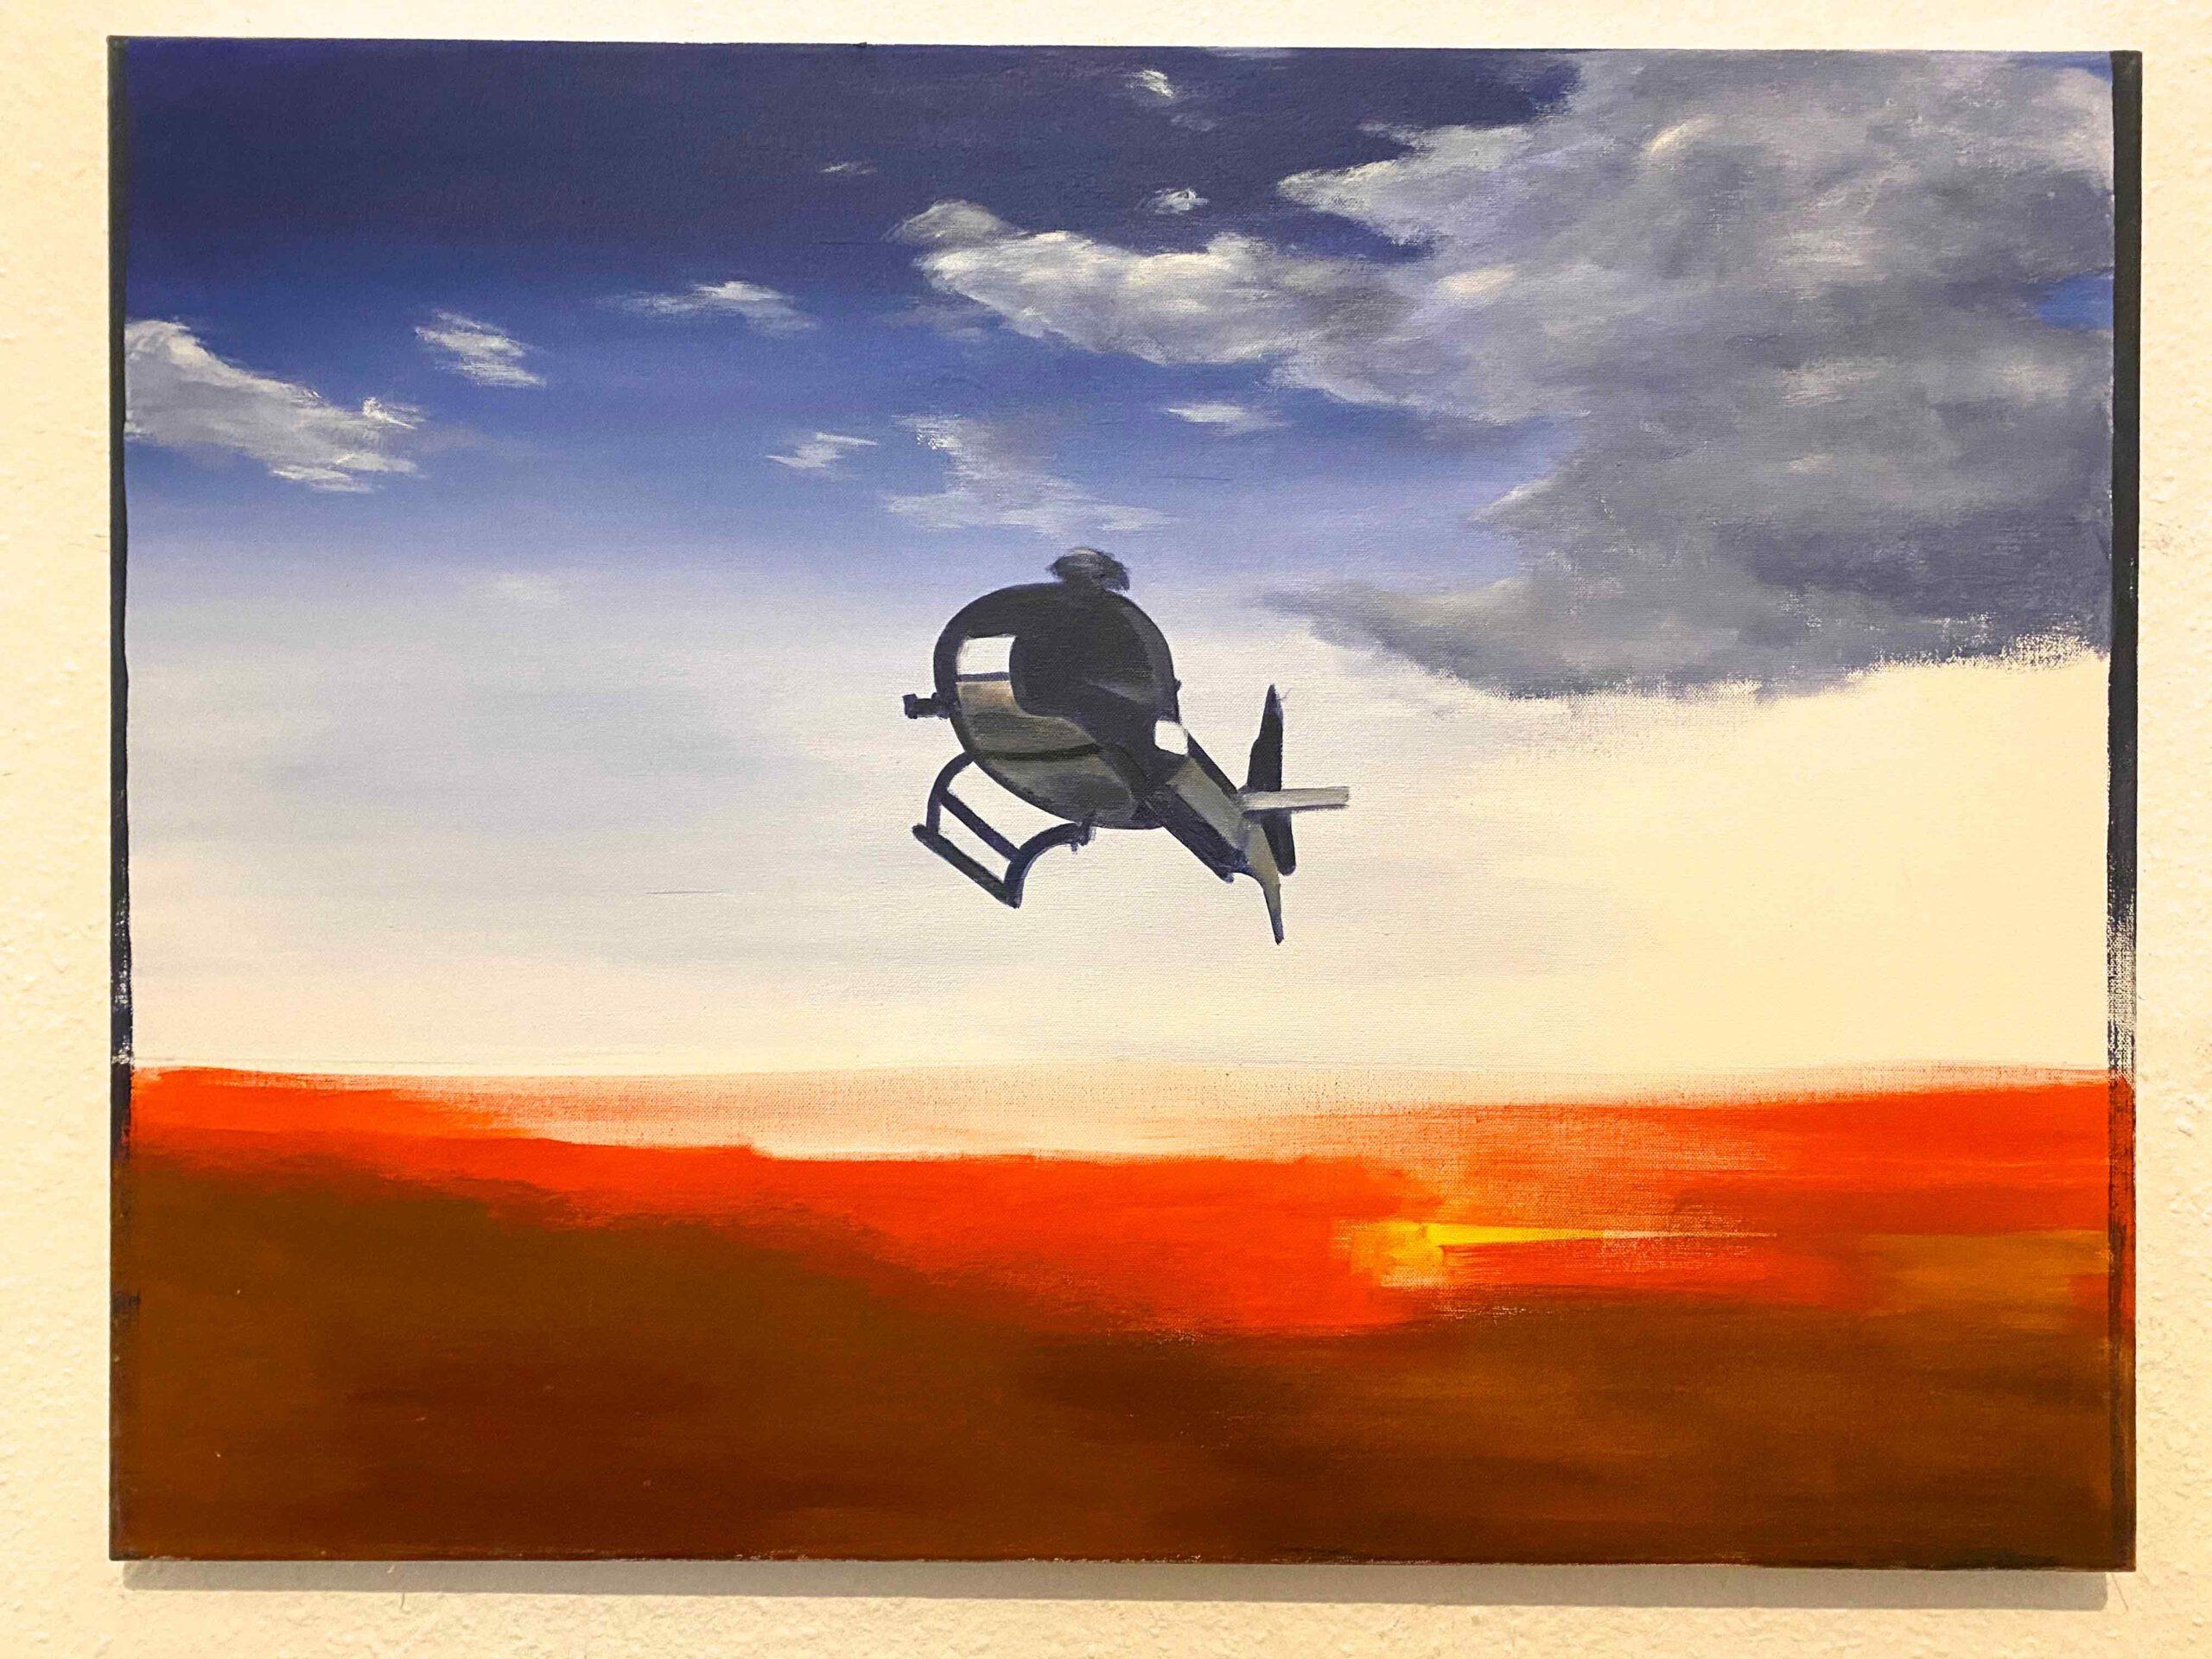 """Helicopter X"" Acryl auf Leinwand, 60 x 80 cm, Felix Rieger 2018"